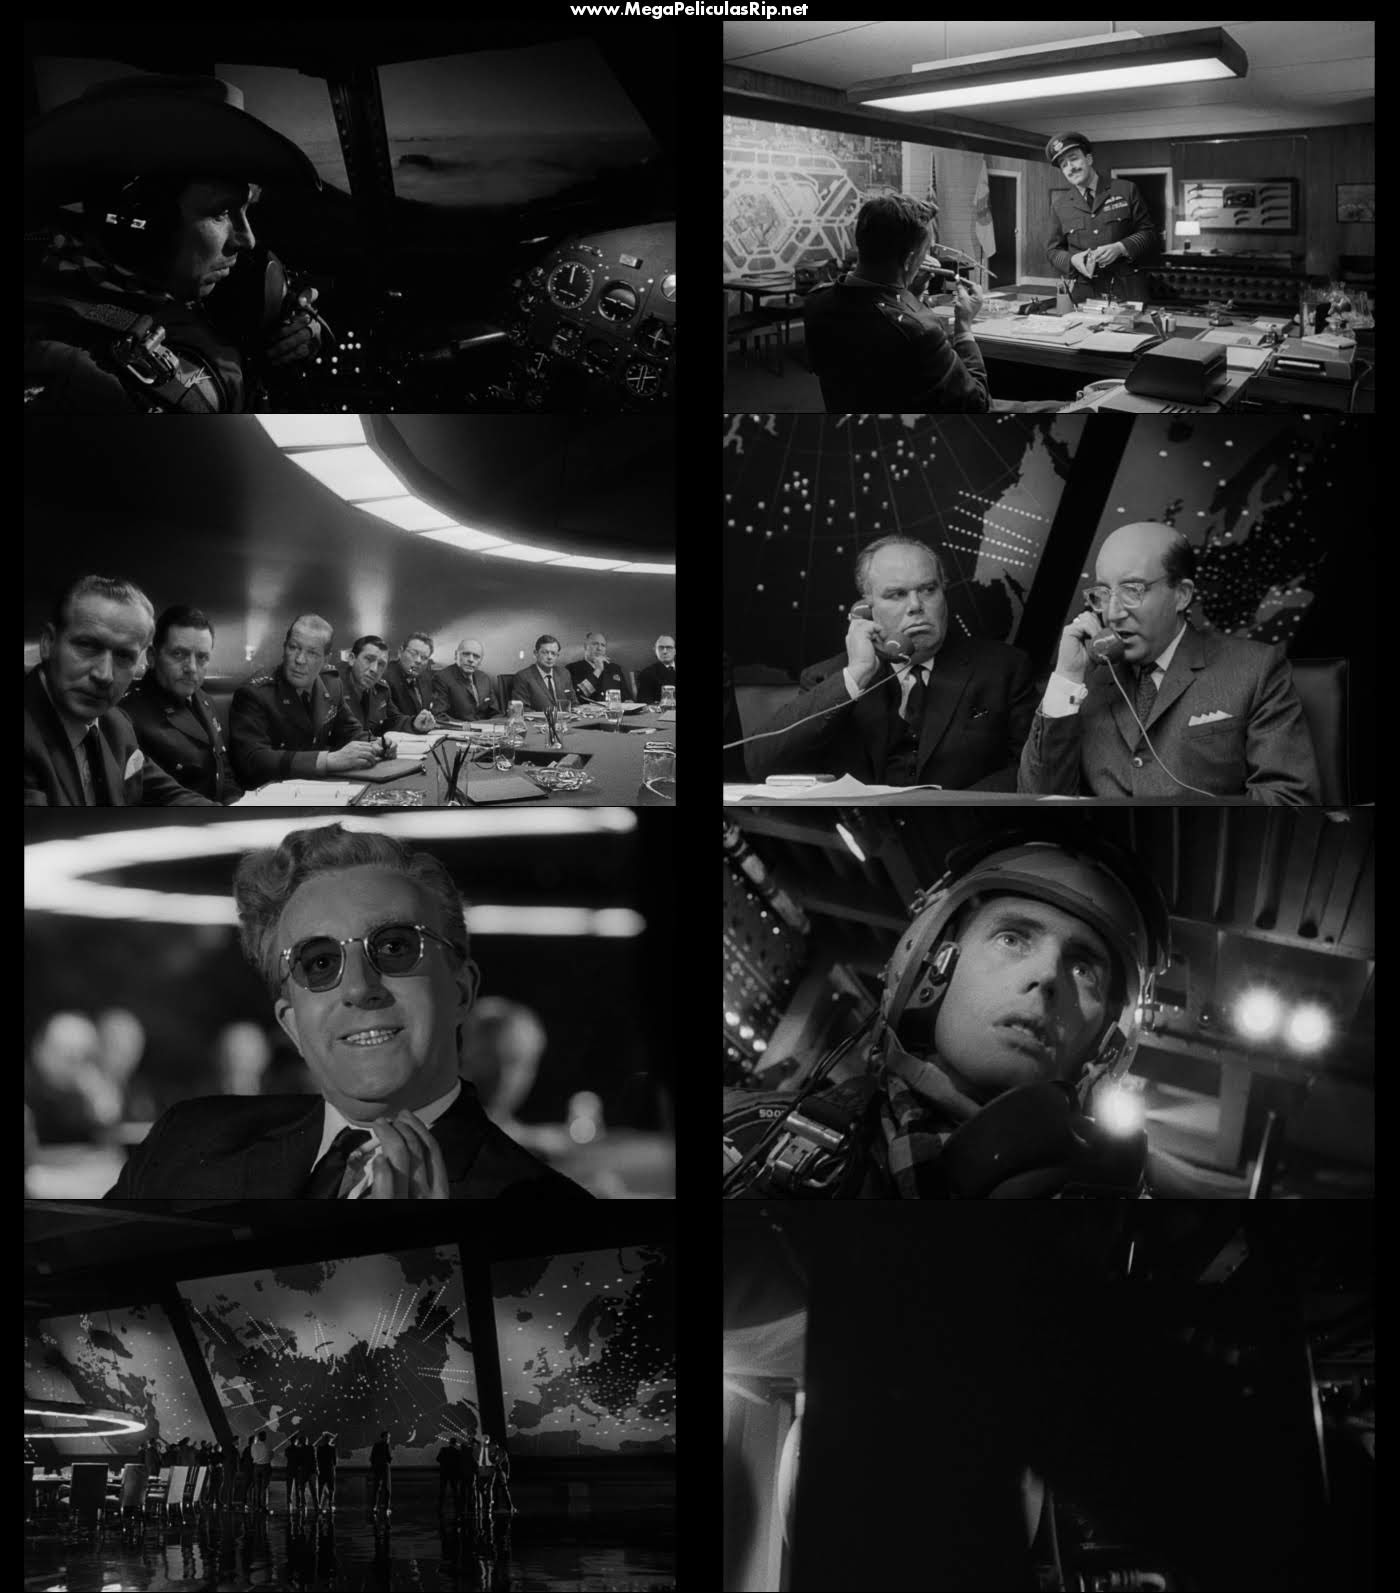 Dr Strangelove 1080p